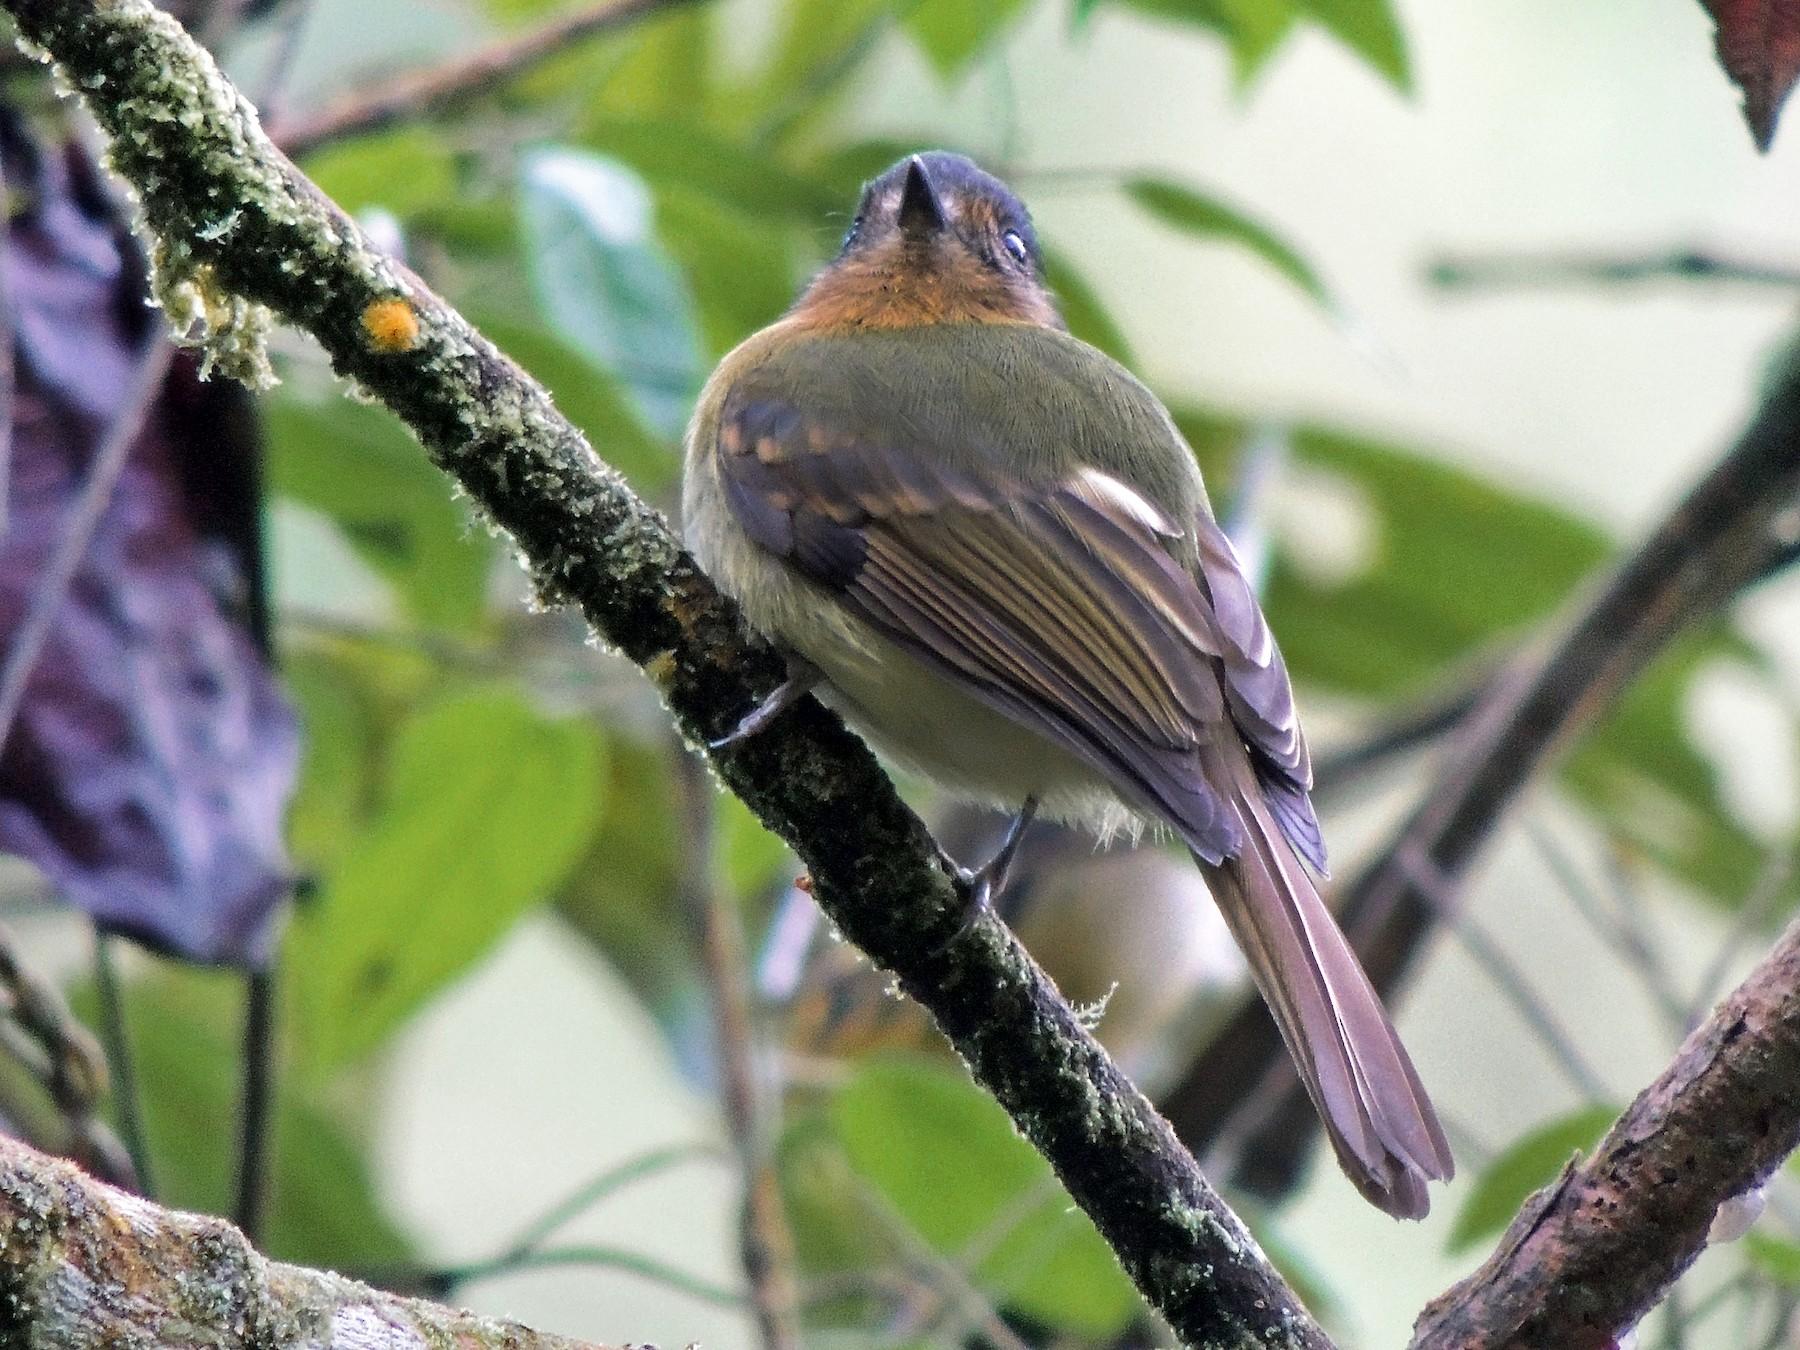 Rufous-breasted Flycatcher - Adalberto Quiroga Villada